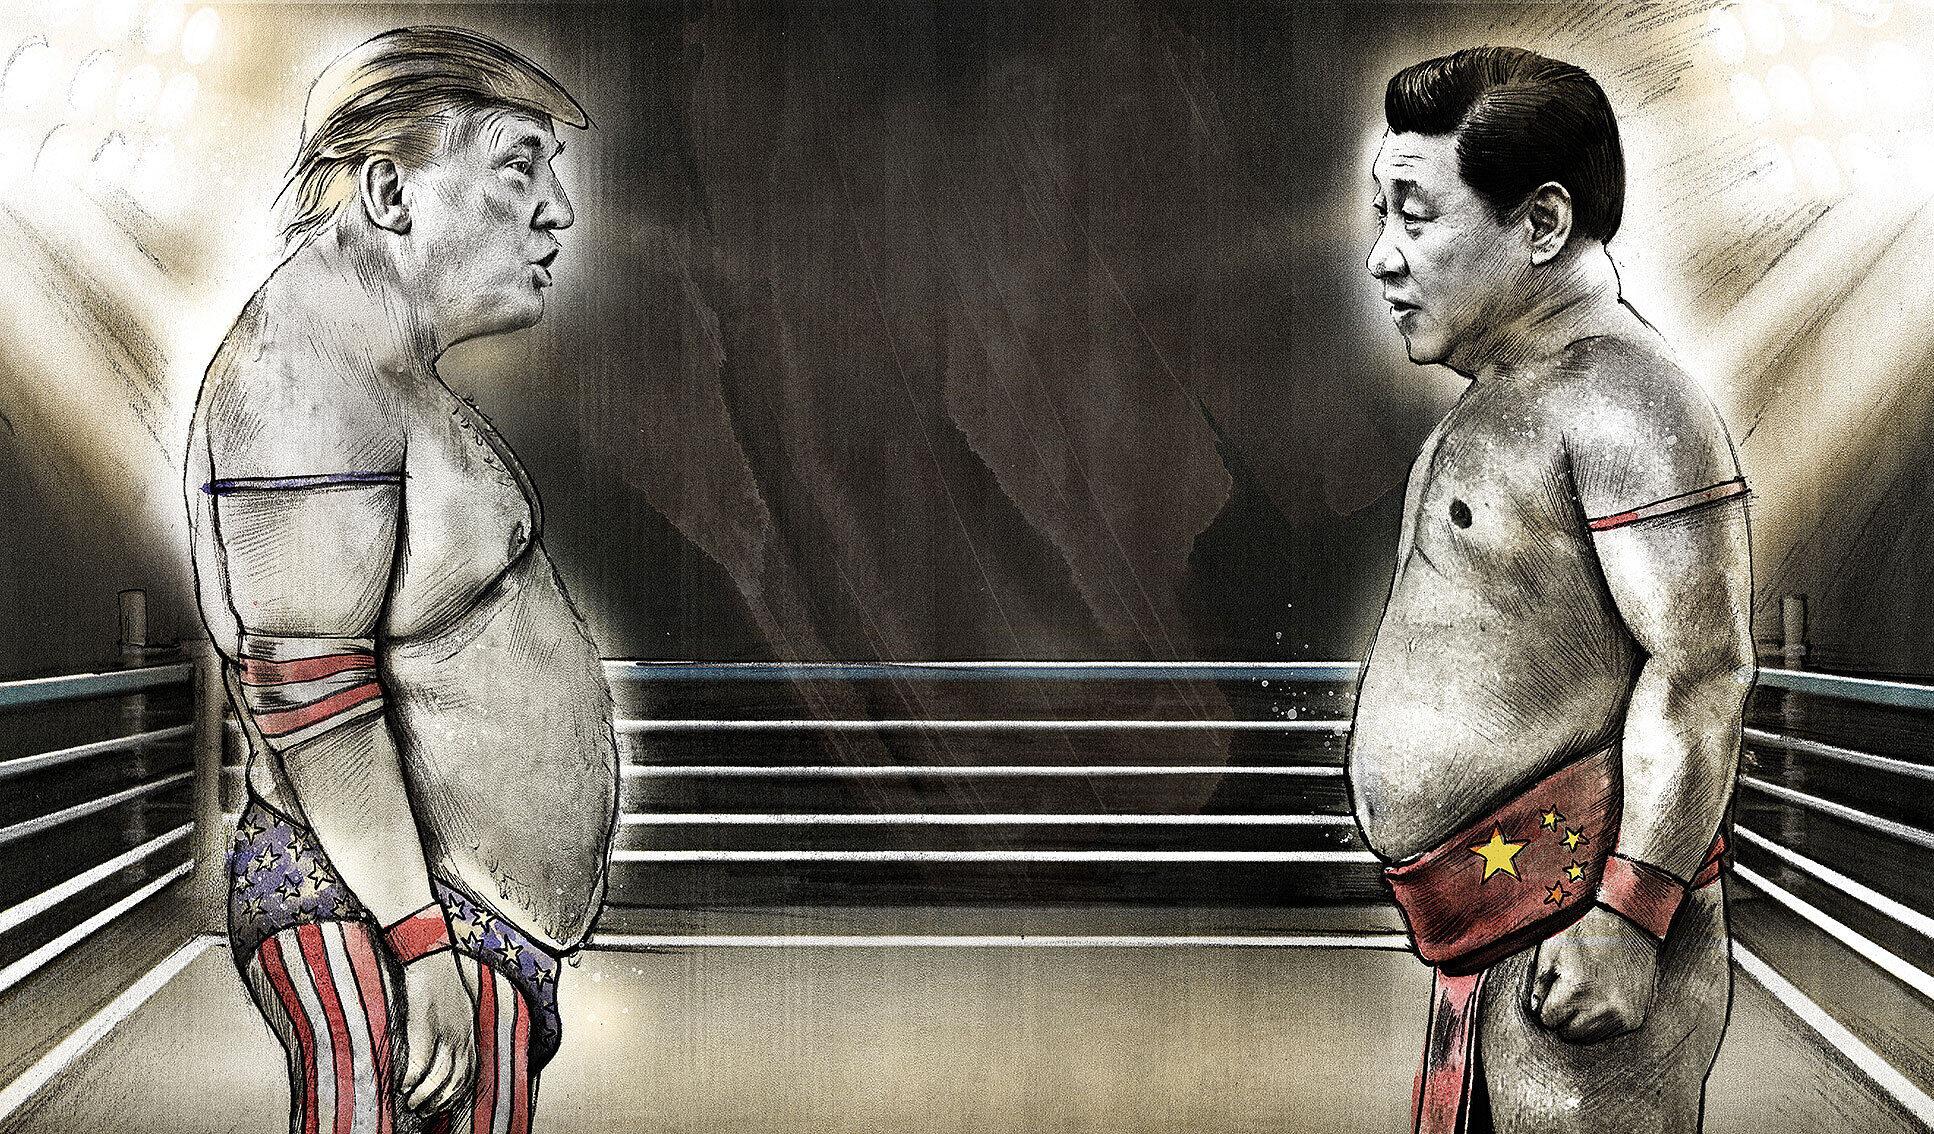 Trump vs xi jinping wrestling - Kornel Illustration | Kornel Stadler portfolio